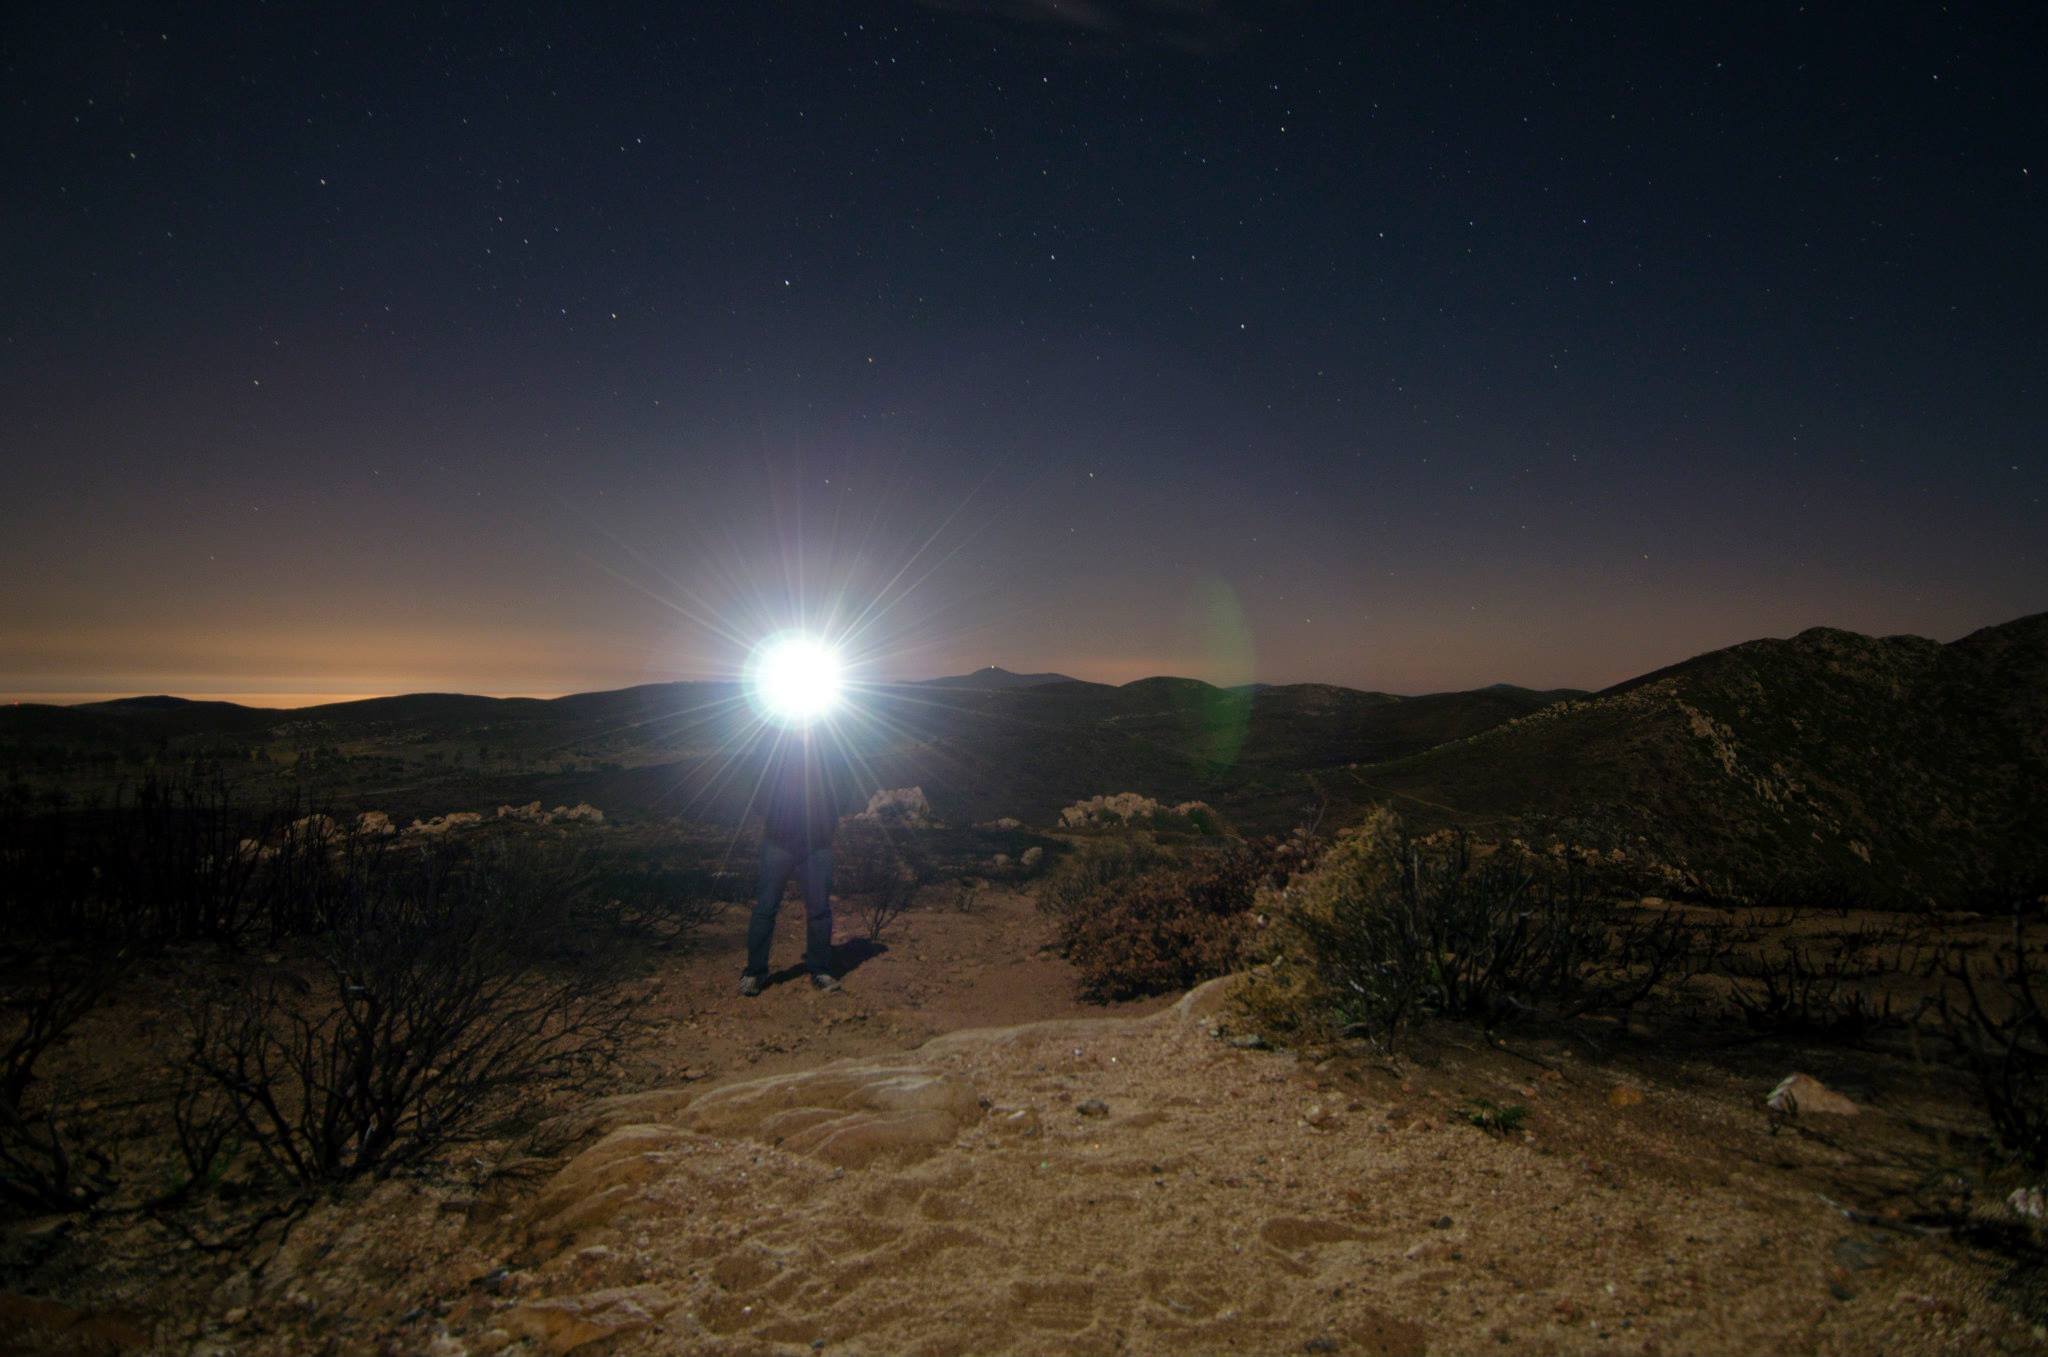 mount-laguna-night.jpg